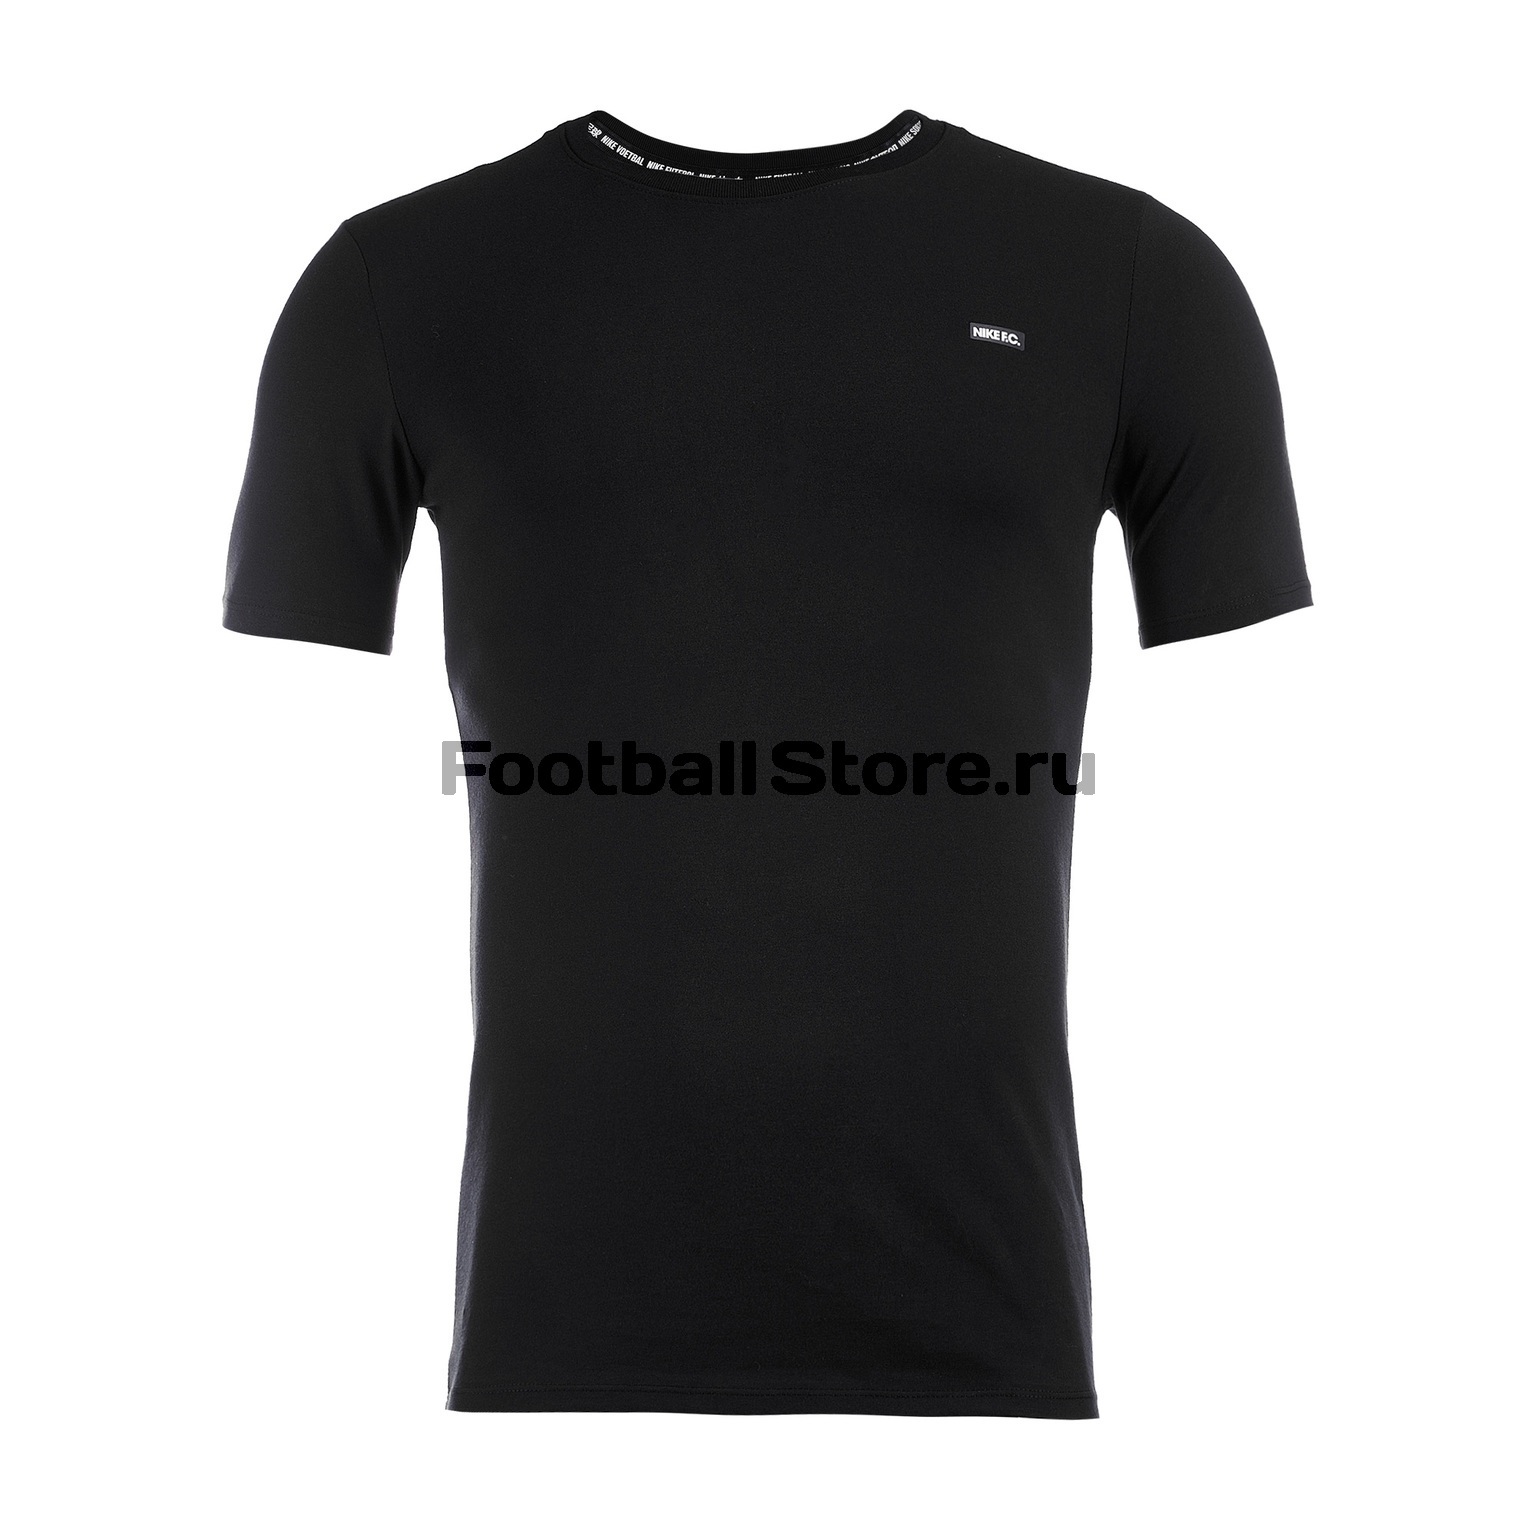 Футболка тренировочная Nike F.C. Dry Tee Small Block AH9657-010 футболки nike тренировочная футболка женская nike w nsw signal tee logo 821993 010